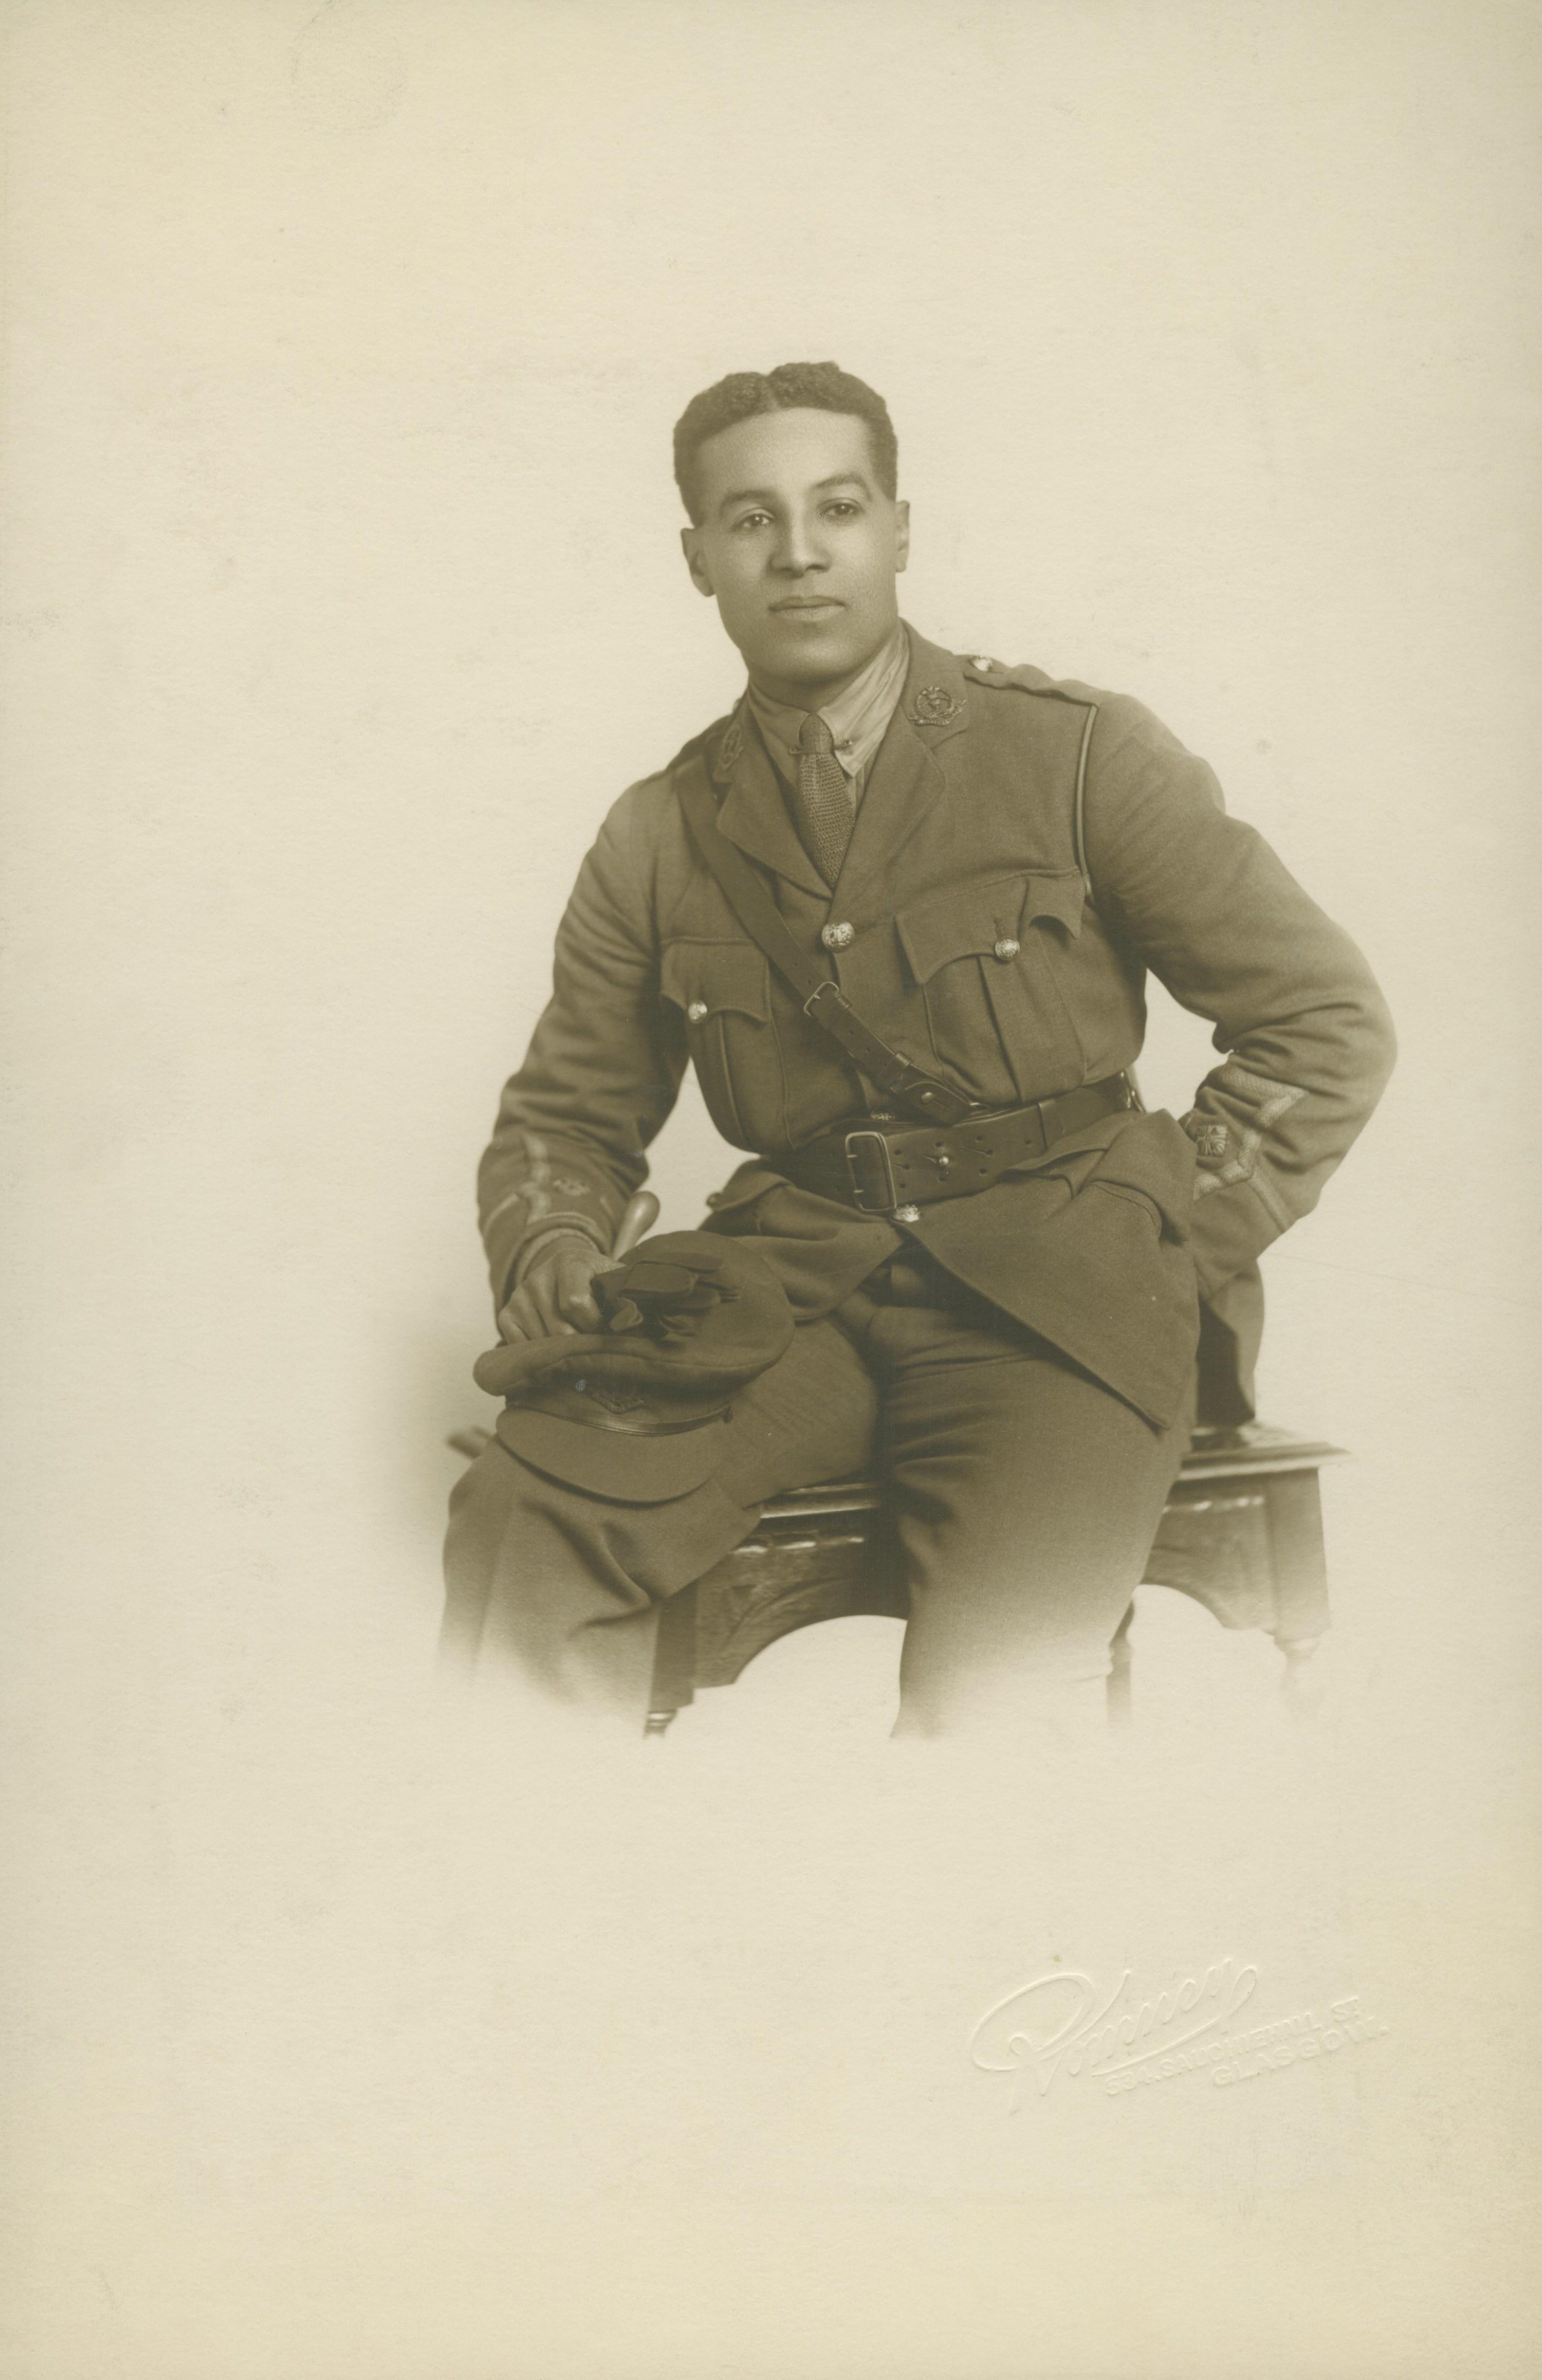 Walter Tull wearing a World War I uniform